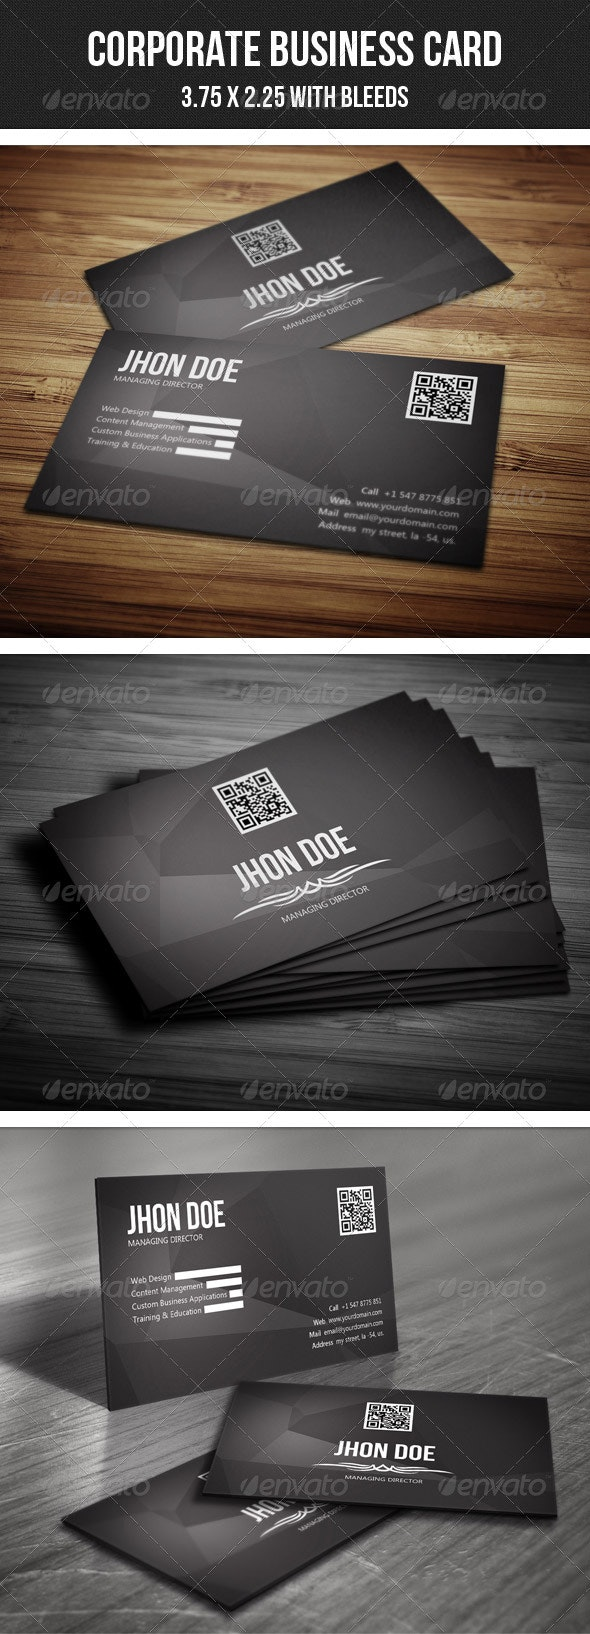 Minimal Corporate Business Card - Corporate Business Cards